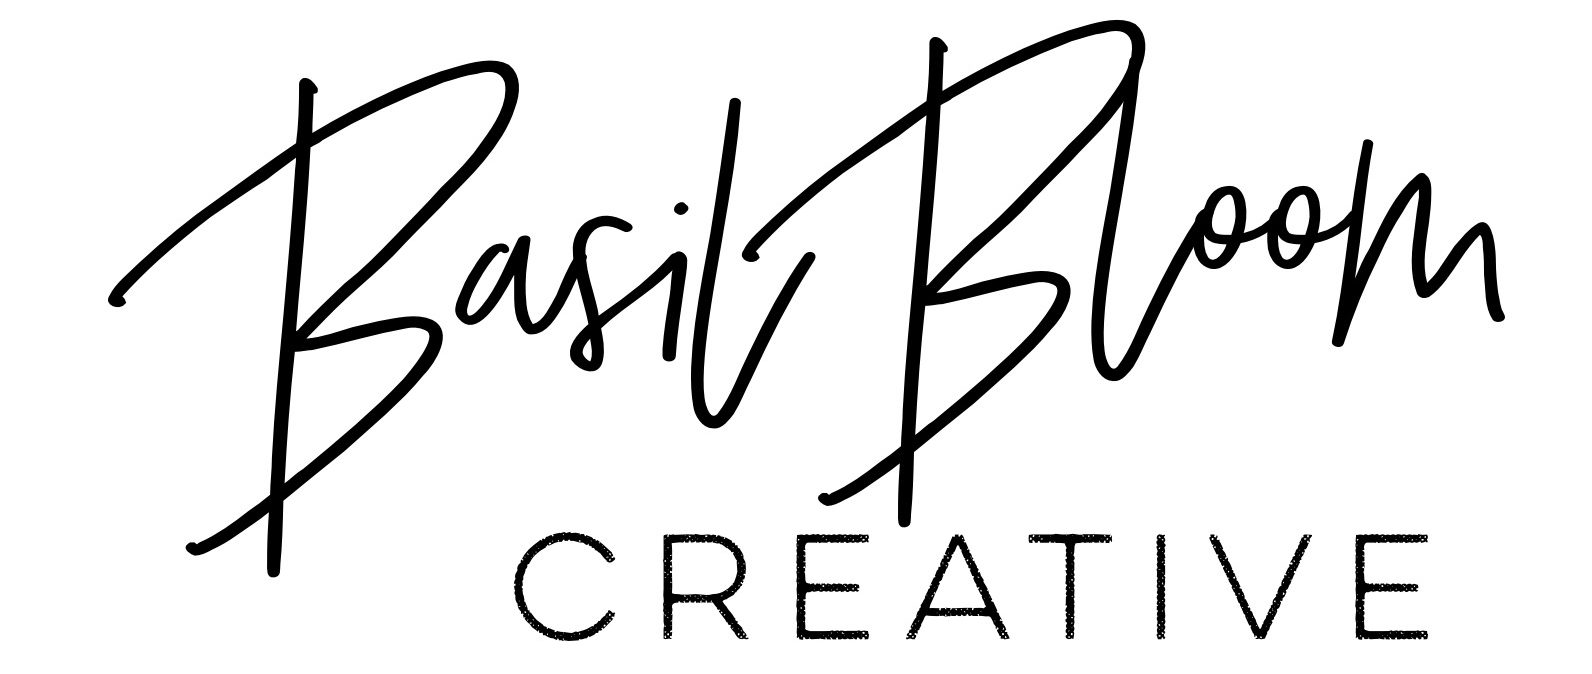 Basil Bloom Creative